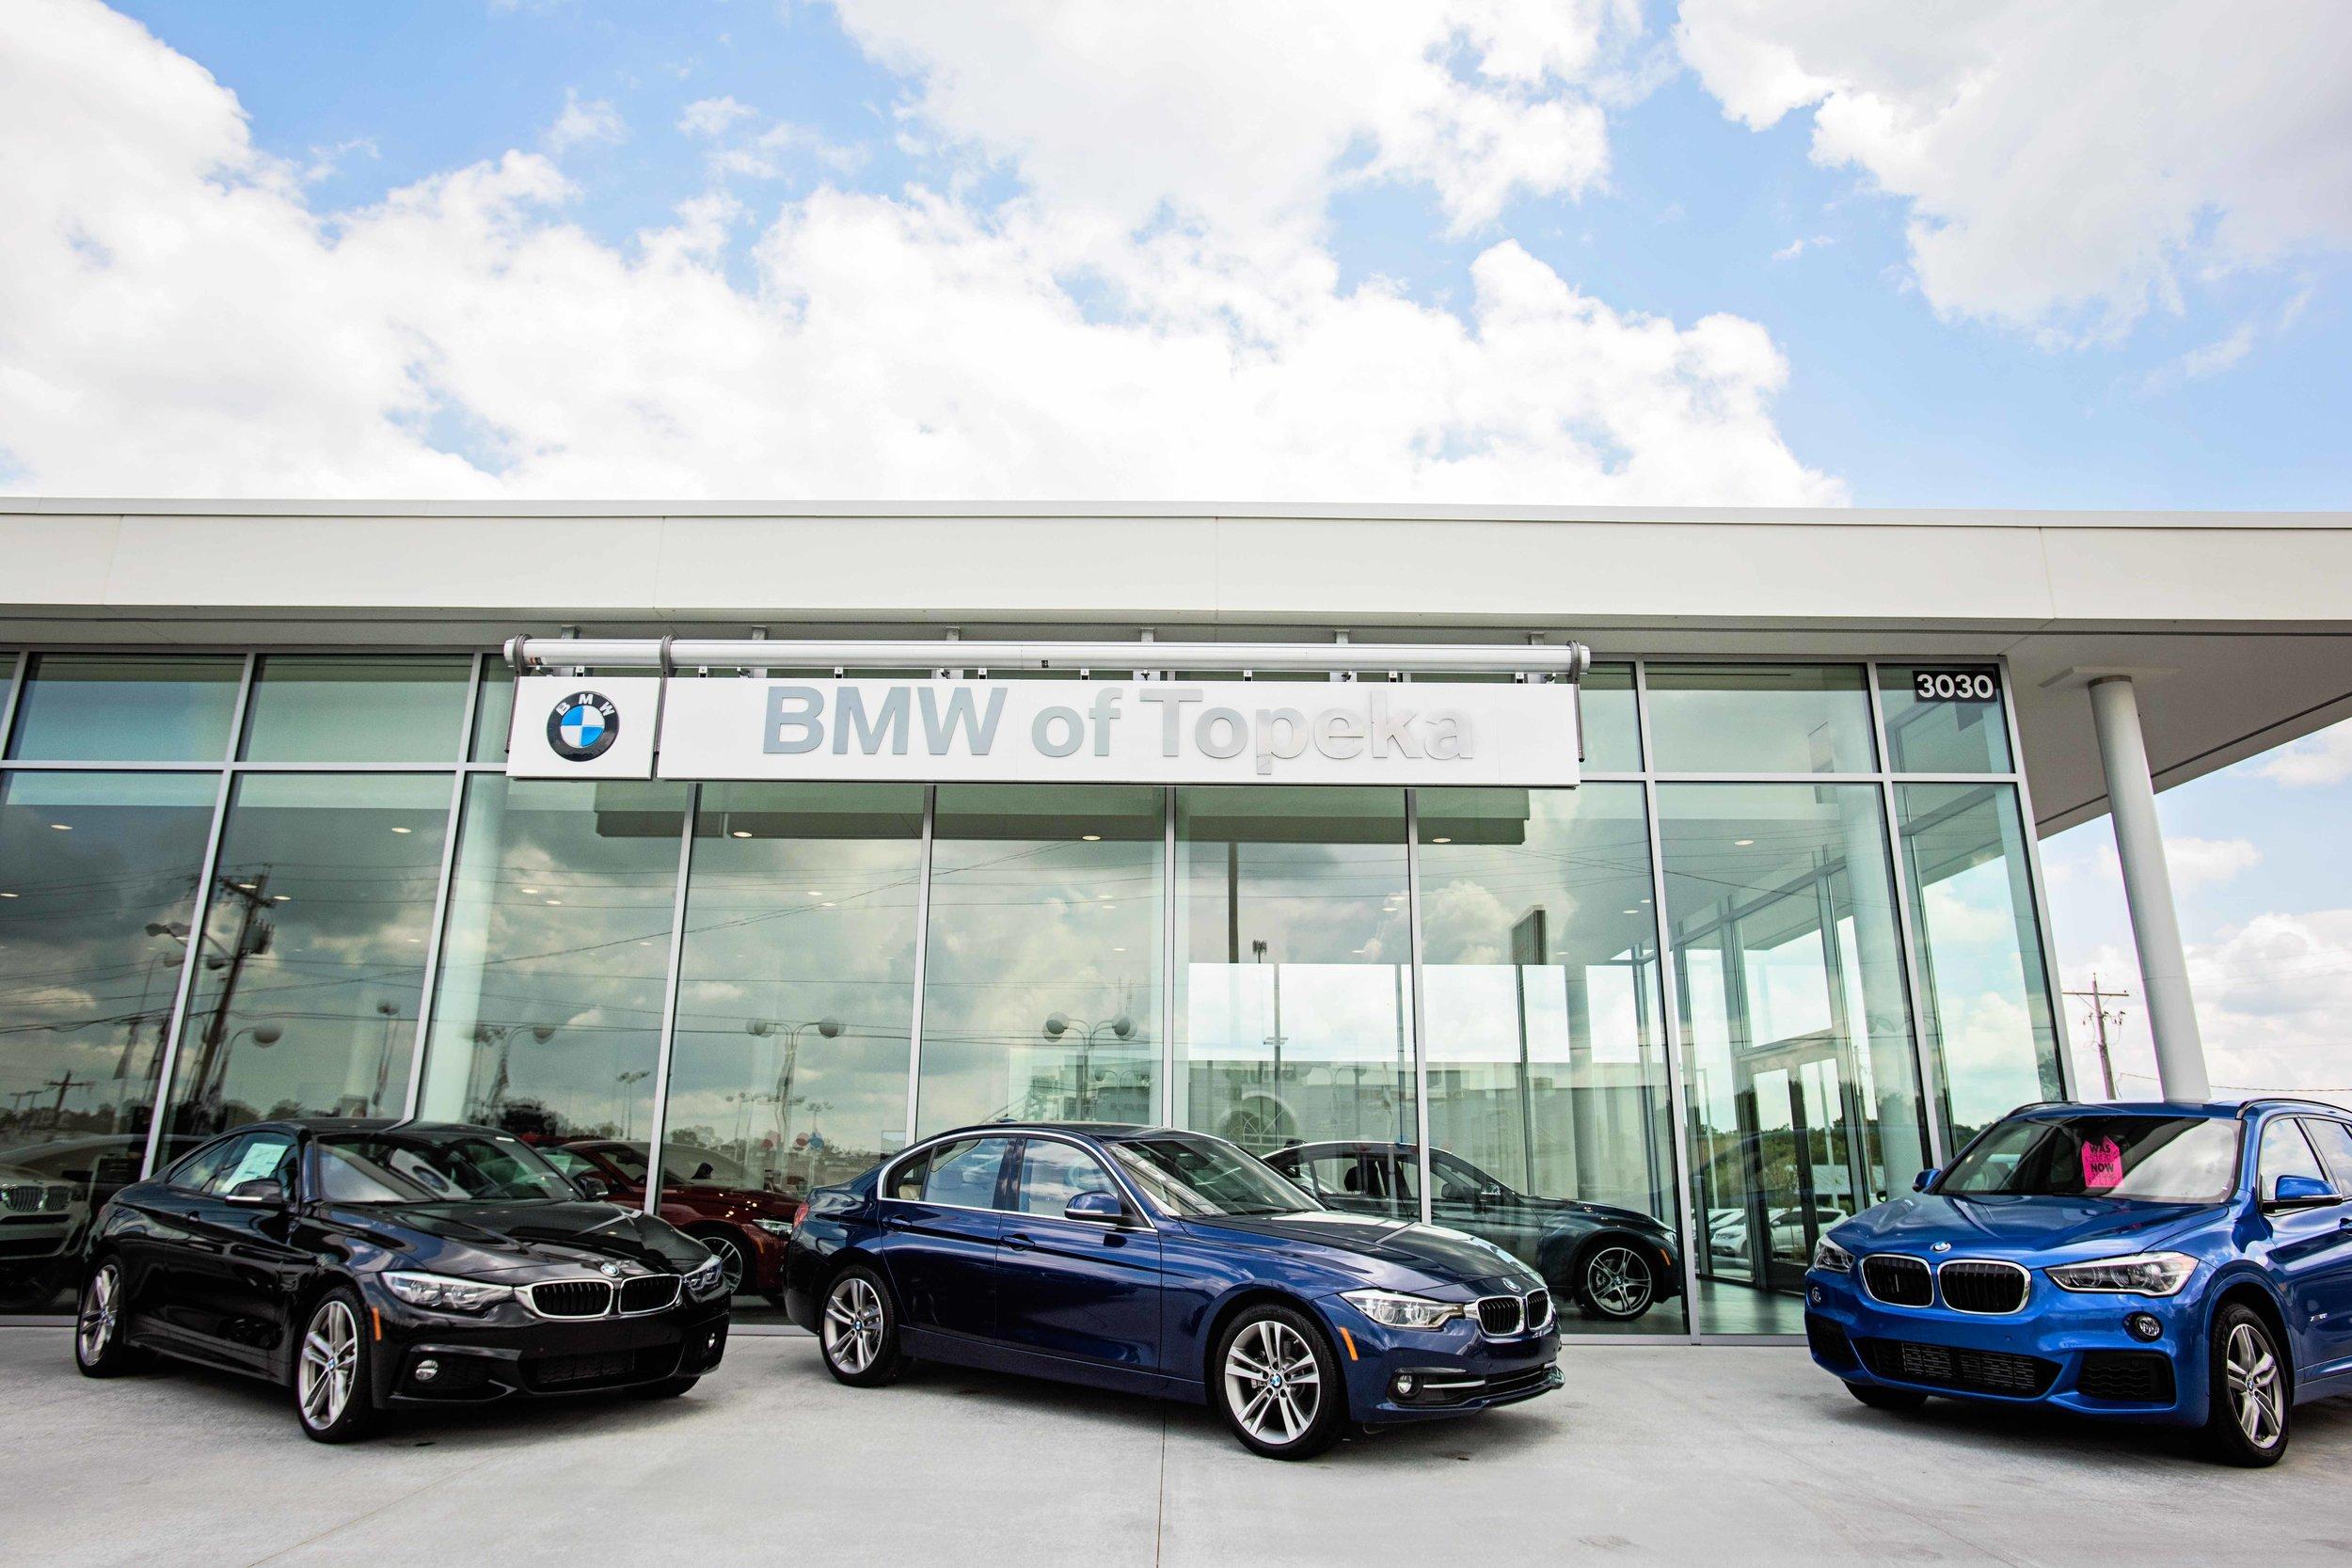 BMW of Topeka - Client: Soave Automotive GroupArchitect: Slaggie Architects, Inc.